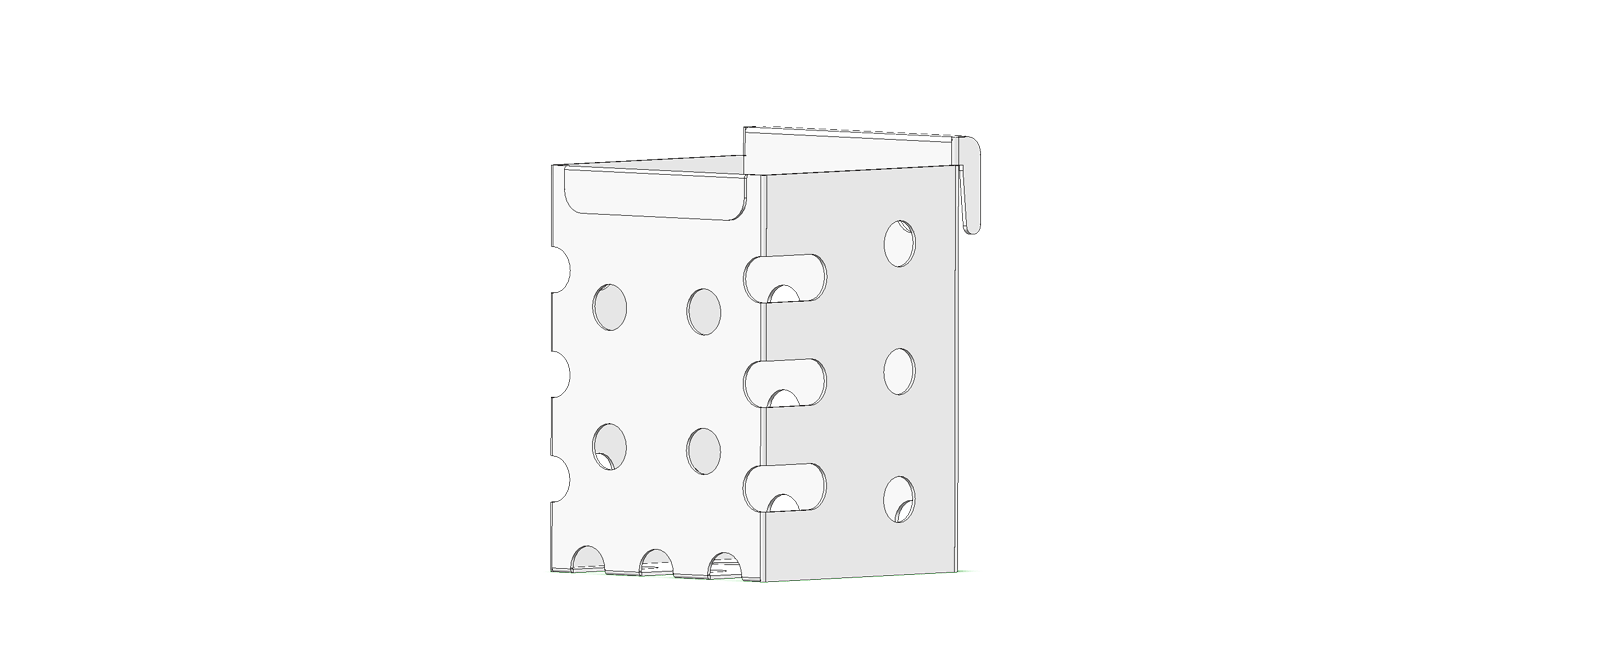 metal_basket_parts.png